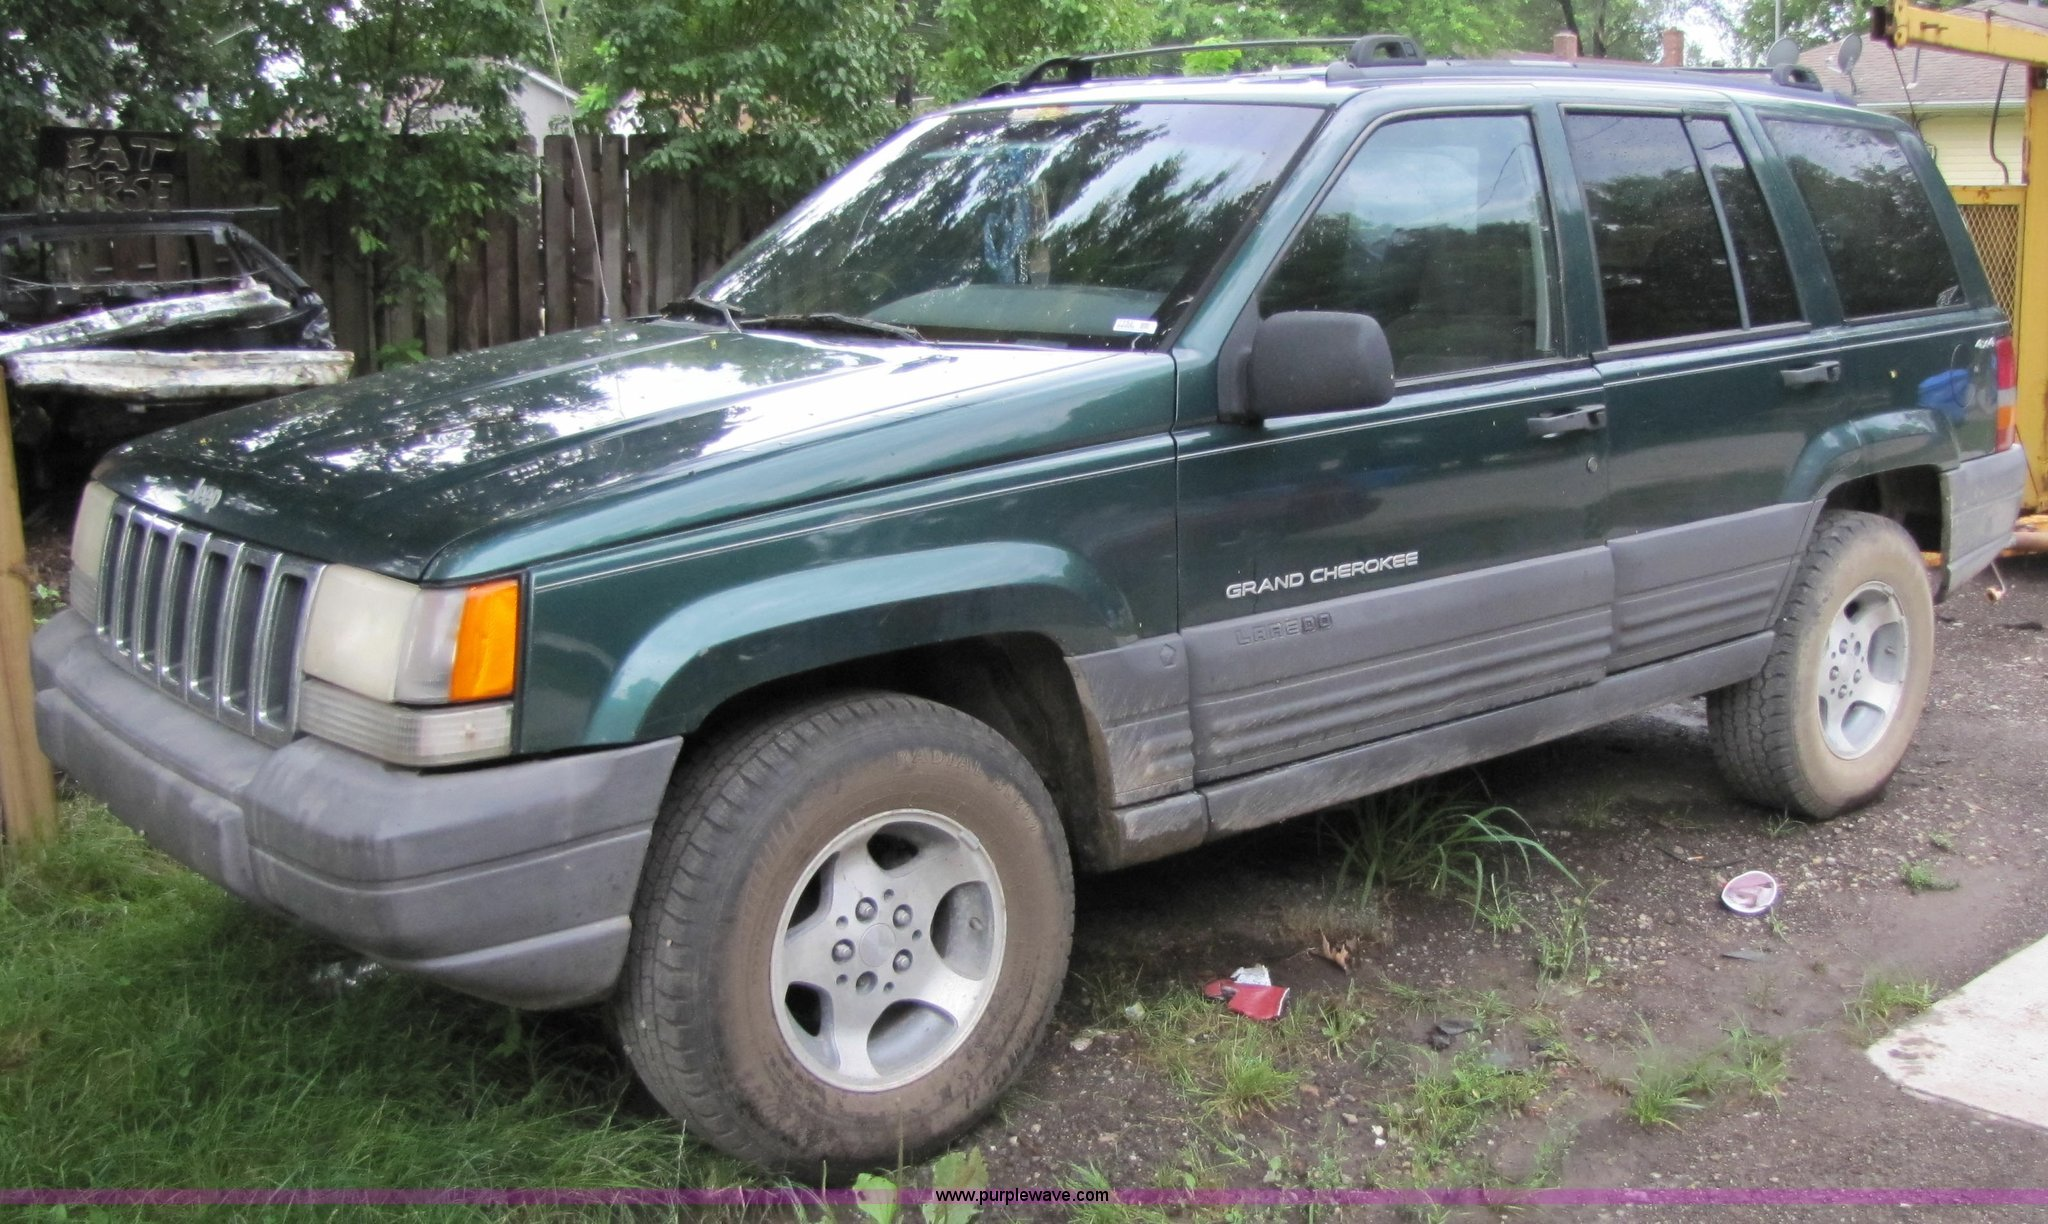 1996 jeep grand cherokee laredo   item 7152   sold! august 1